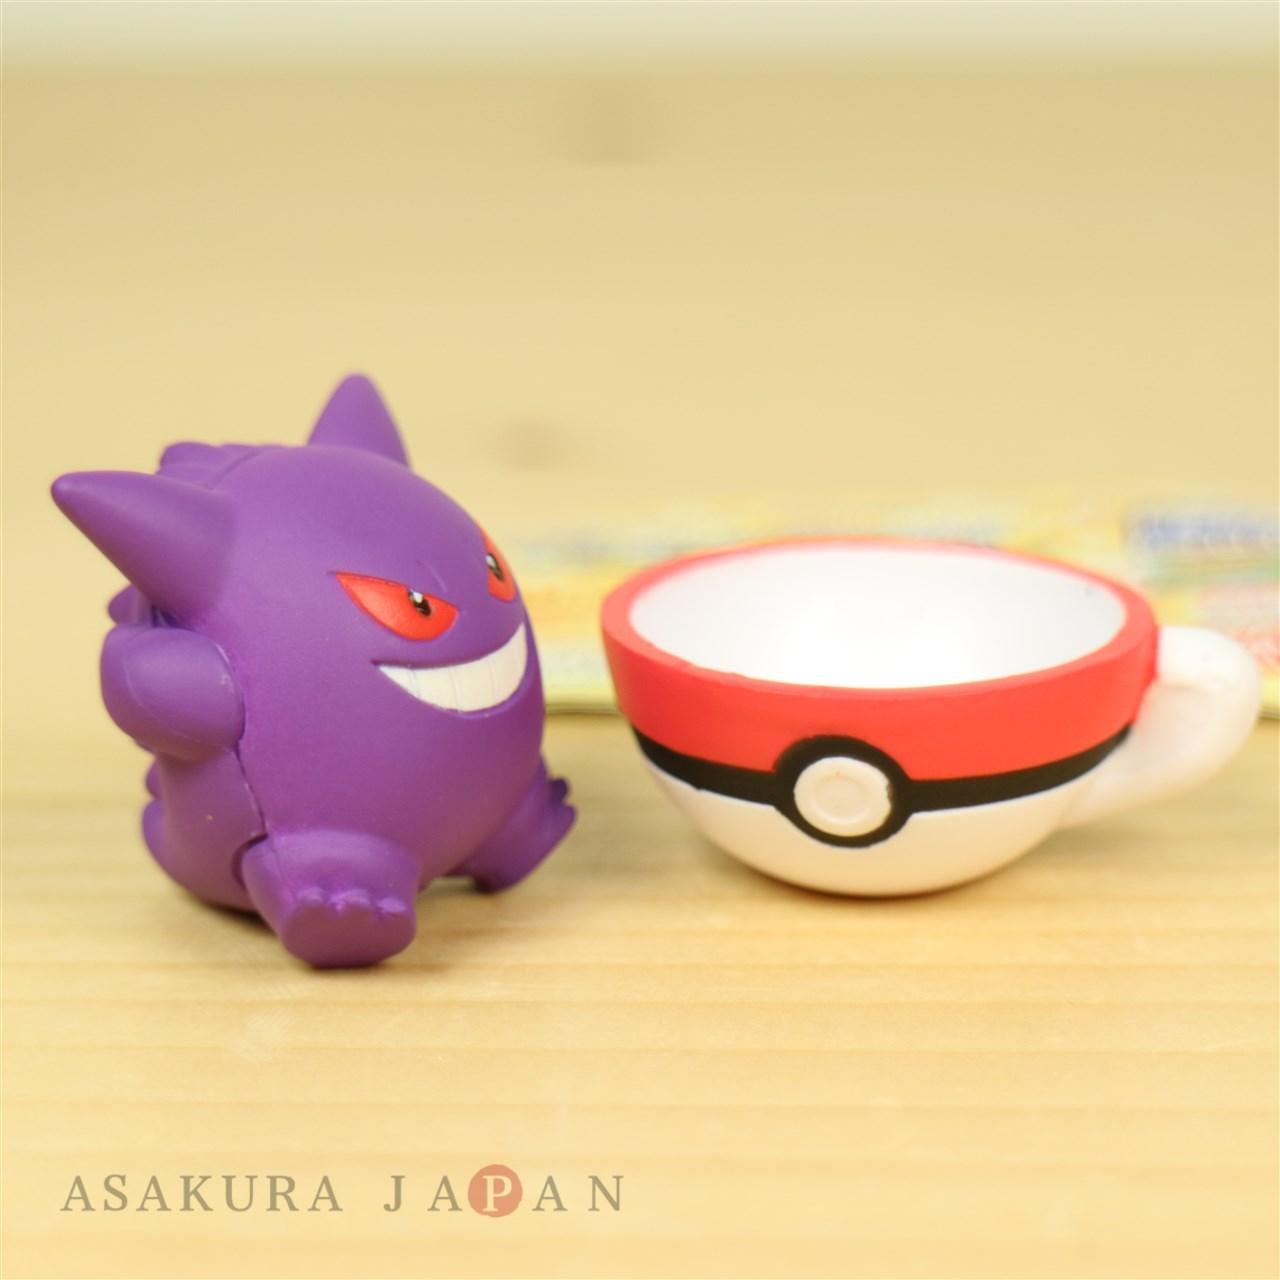 Pokemon Teacup Time Mascot Volume 2 Mini Figure Collection 0483095 Gashapon Tea Cup 4 24573 Gacha Vol4 Gengar Bandai 18072111